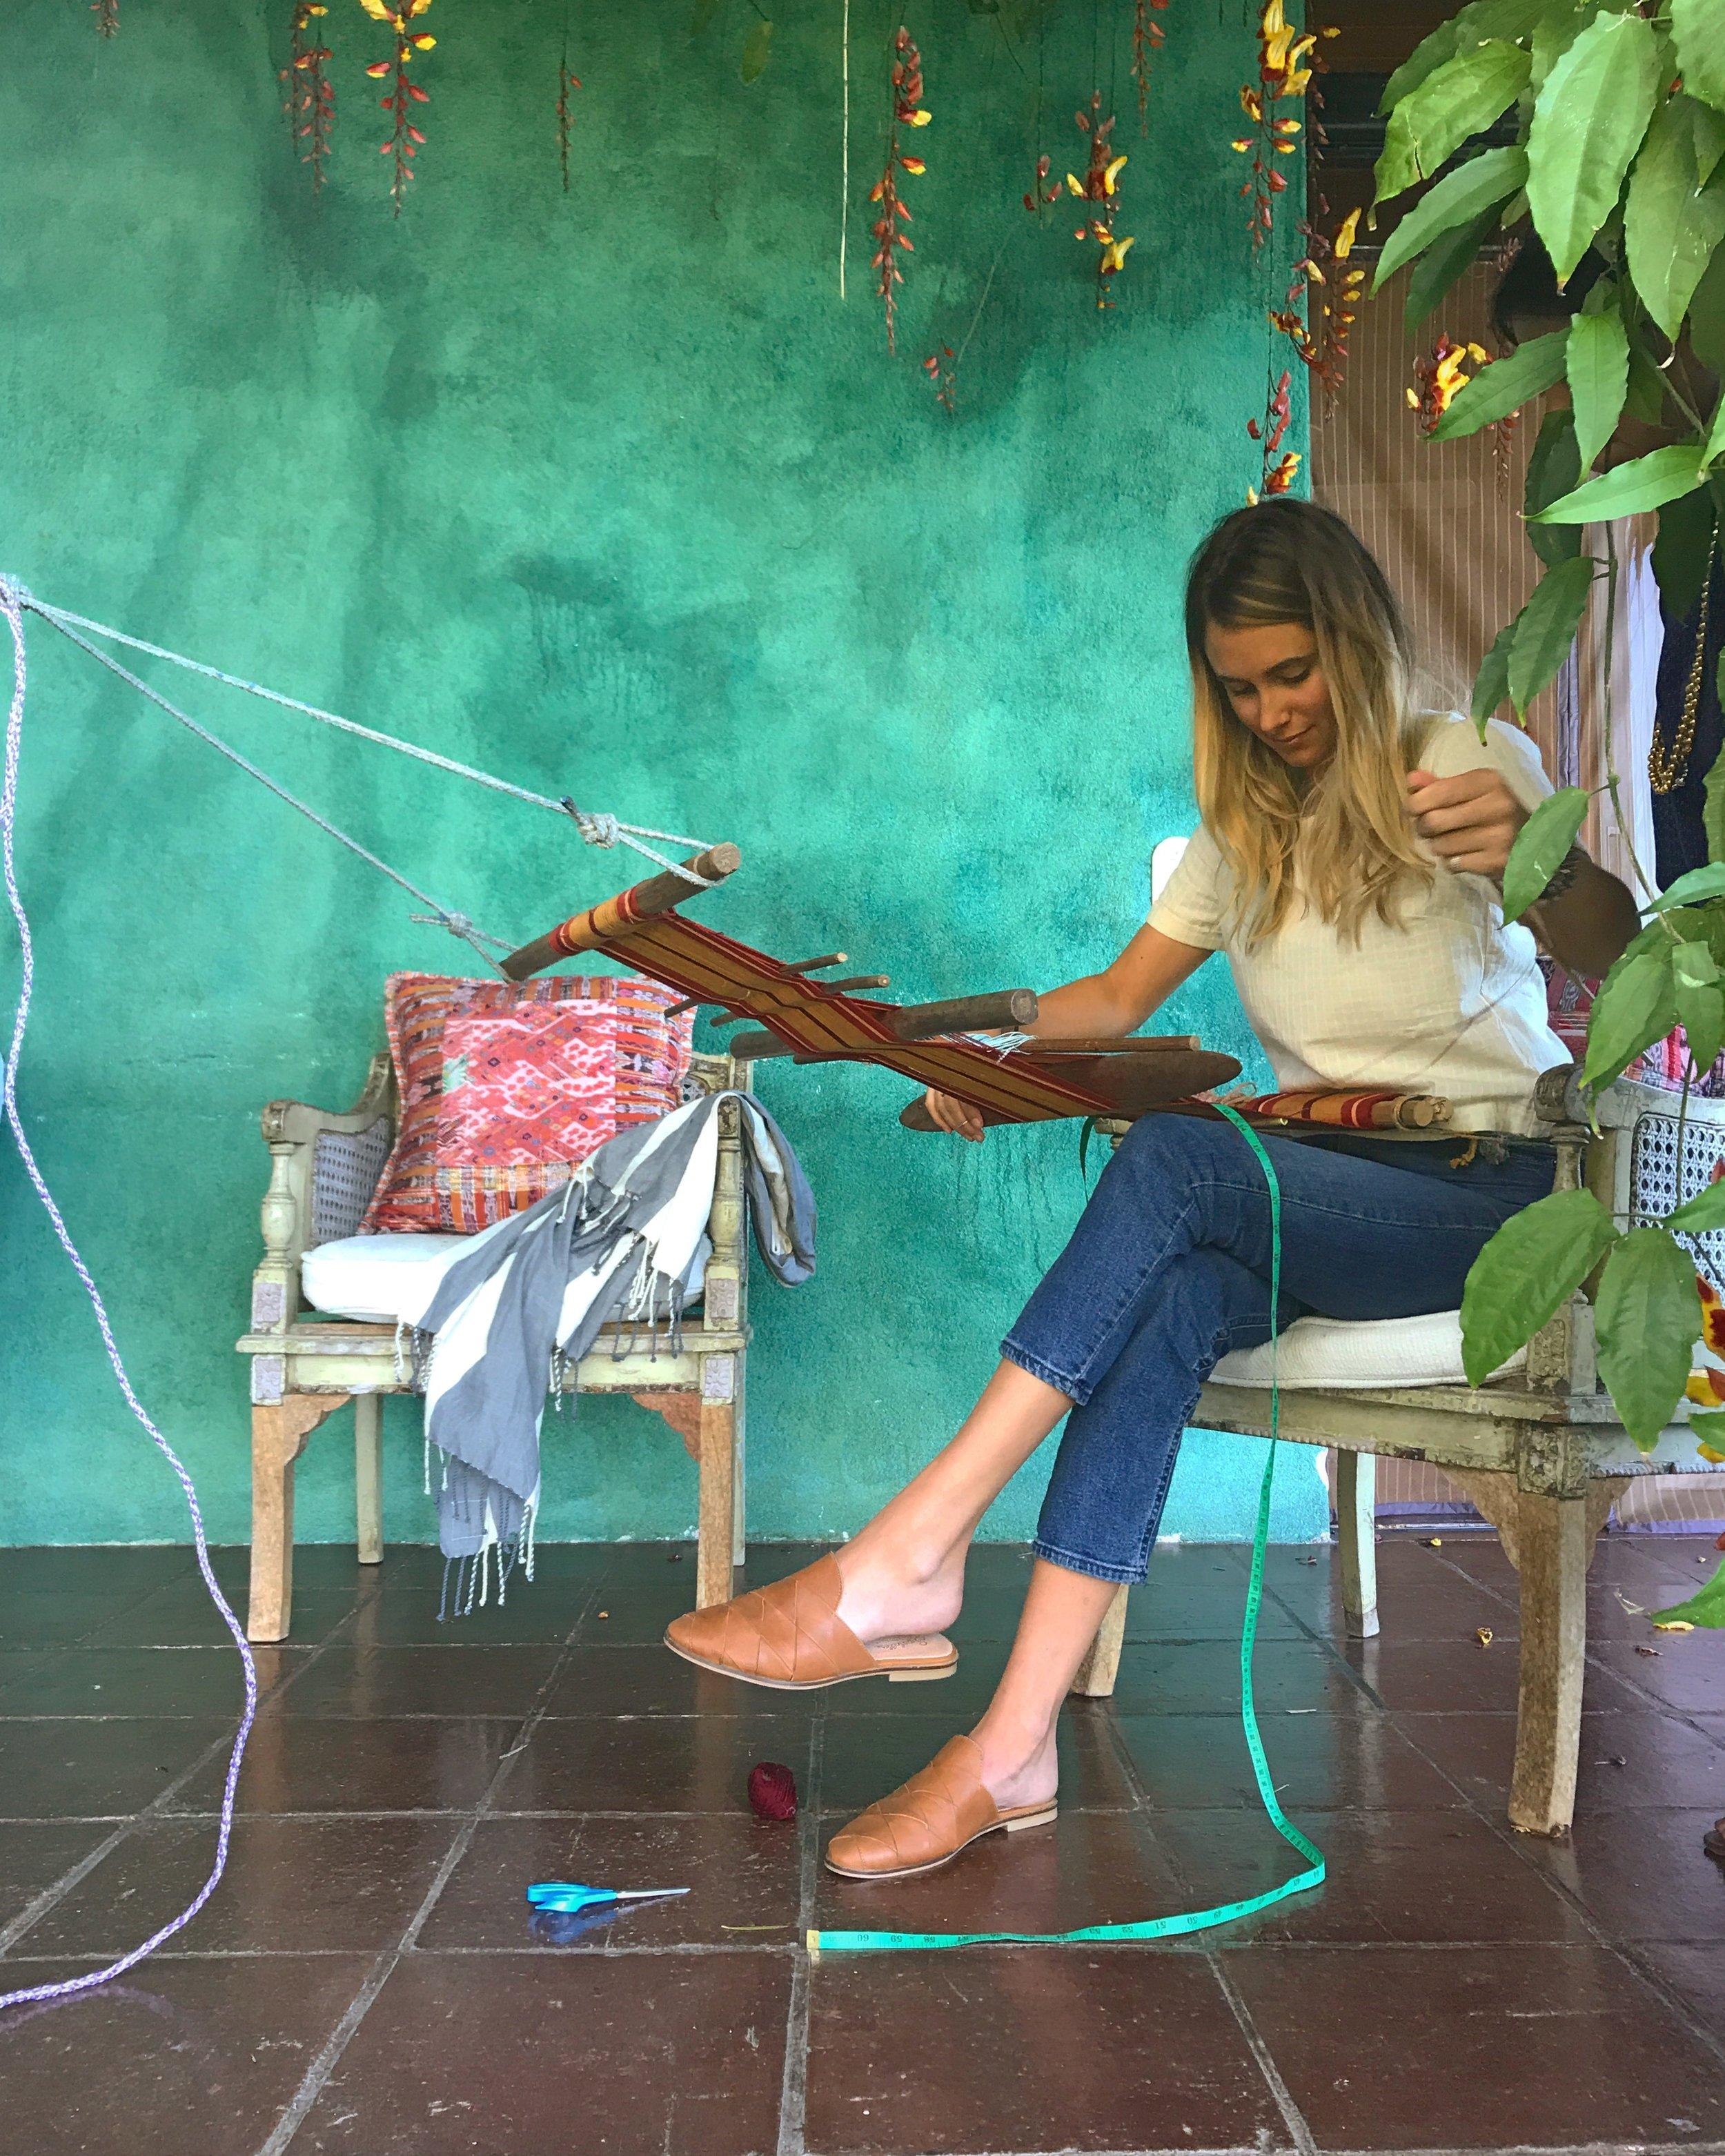 rachel weaving with thread caravan luna zorro in guatemala.jpg